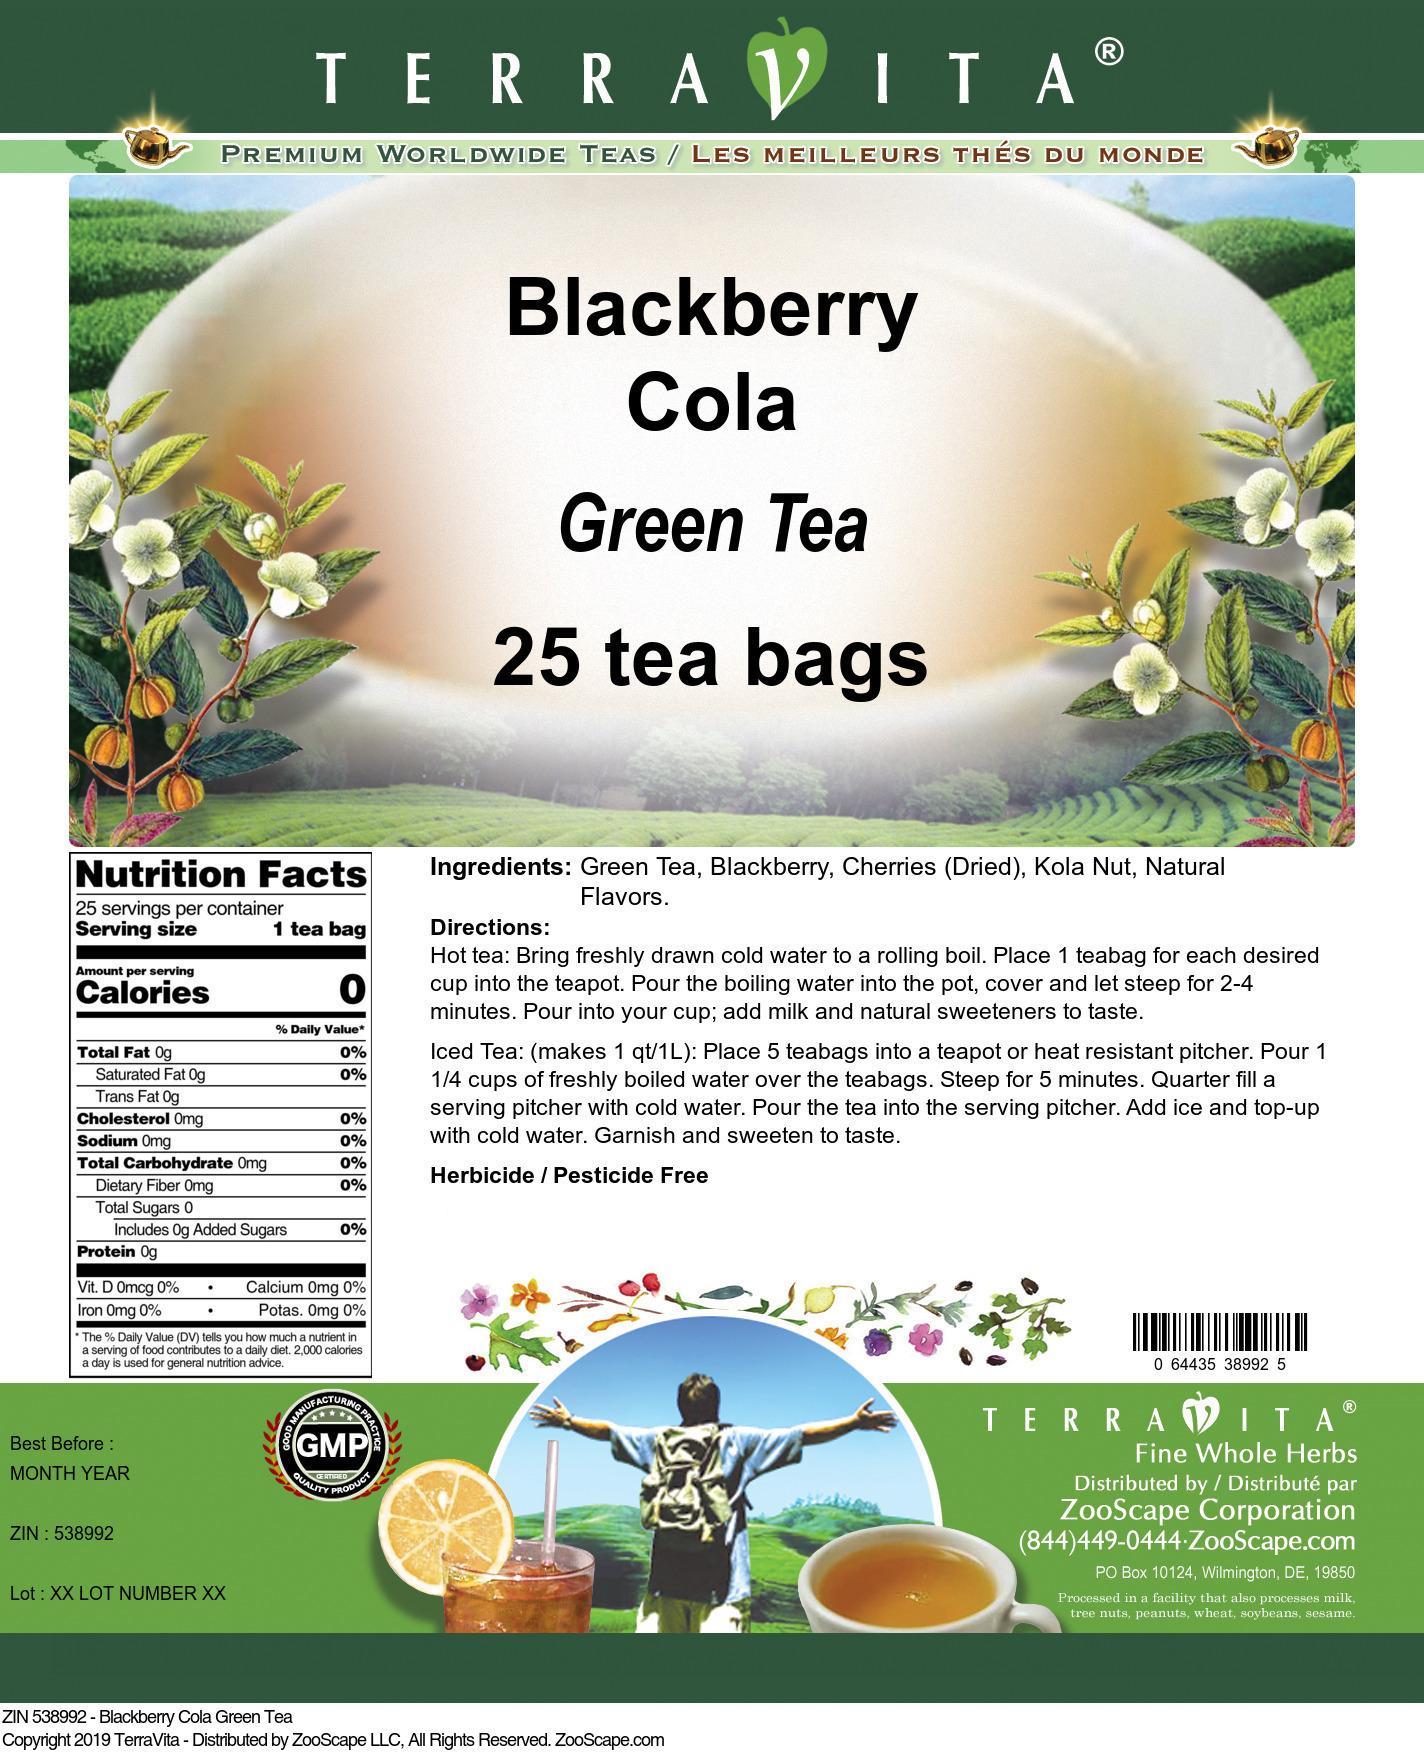 Blackberry Cola Green Tea